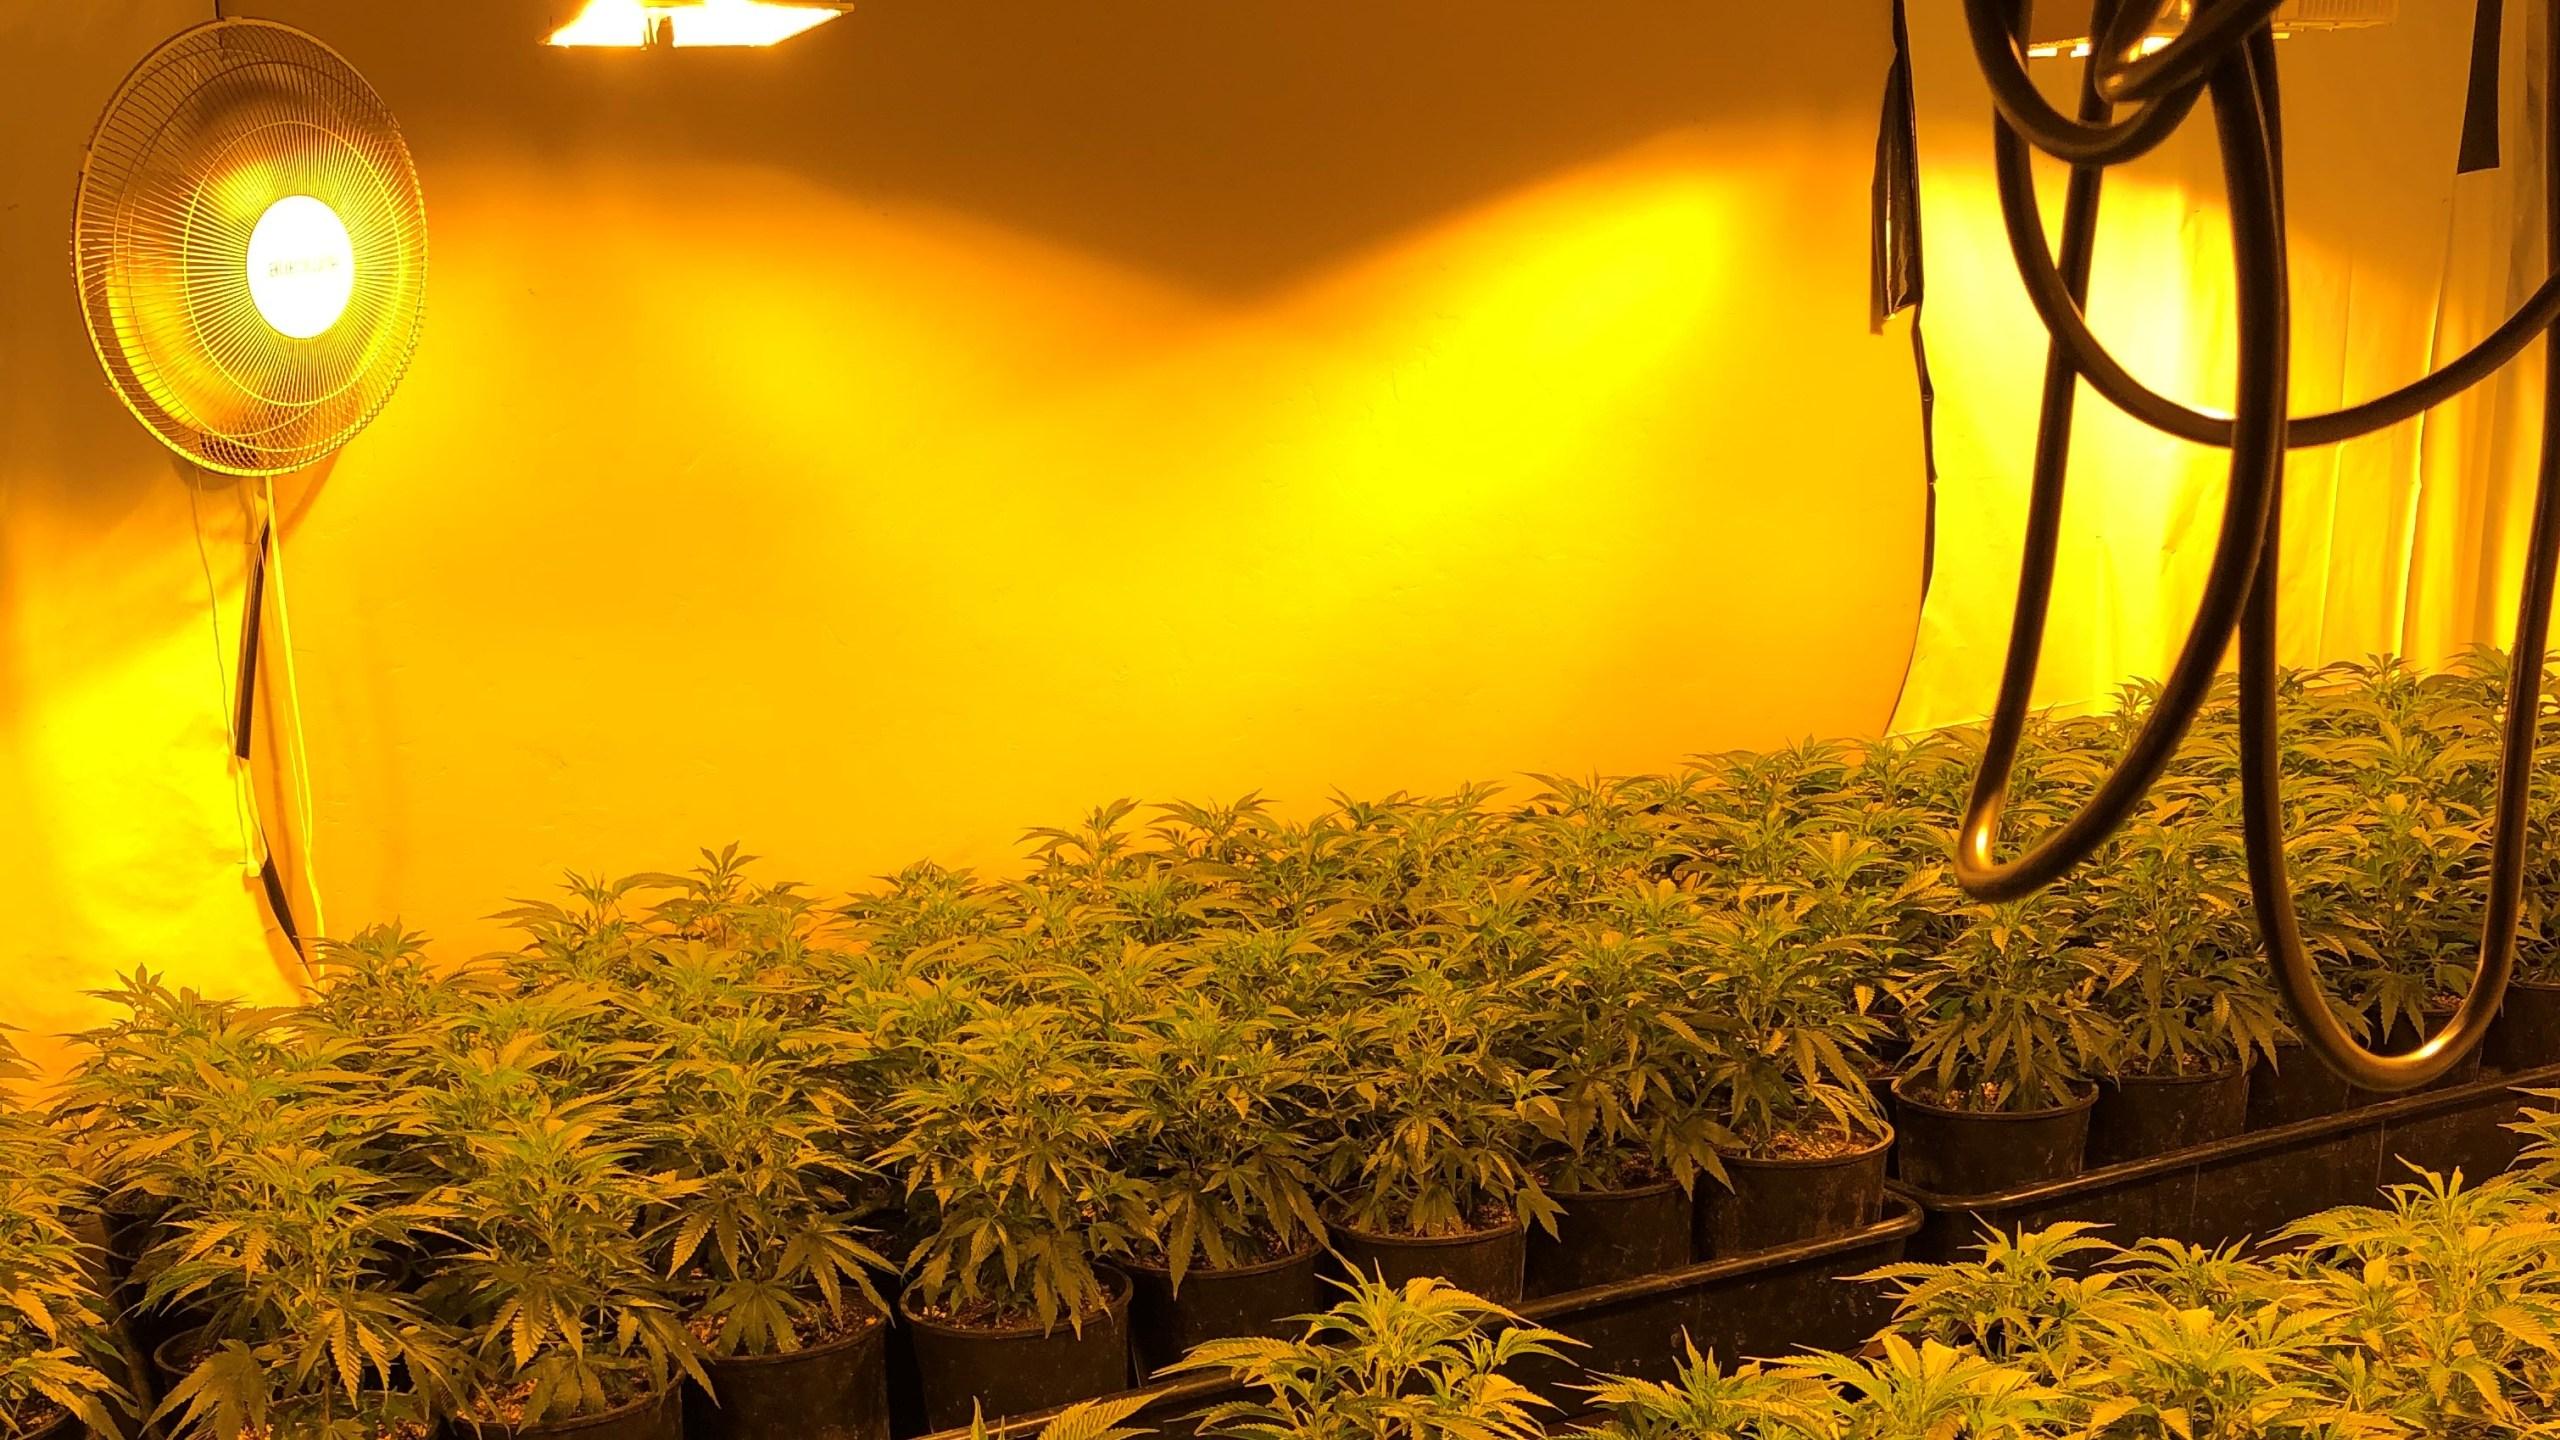 2,700 marijuana plants, illegal firearms, recovered inside Visalia homes